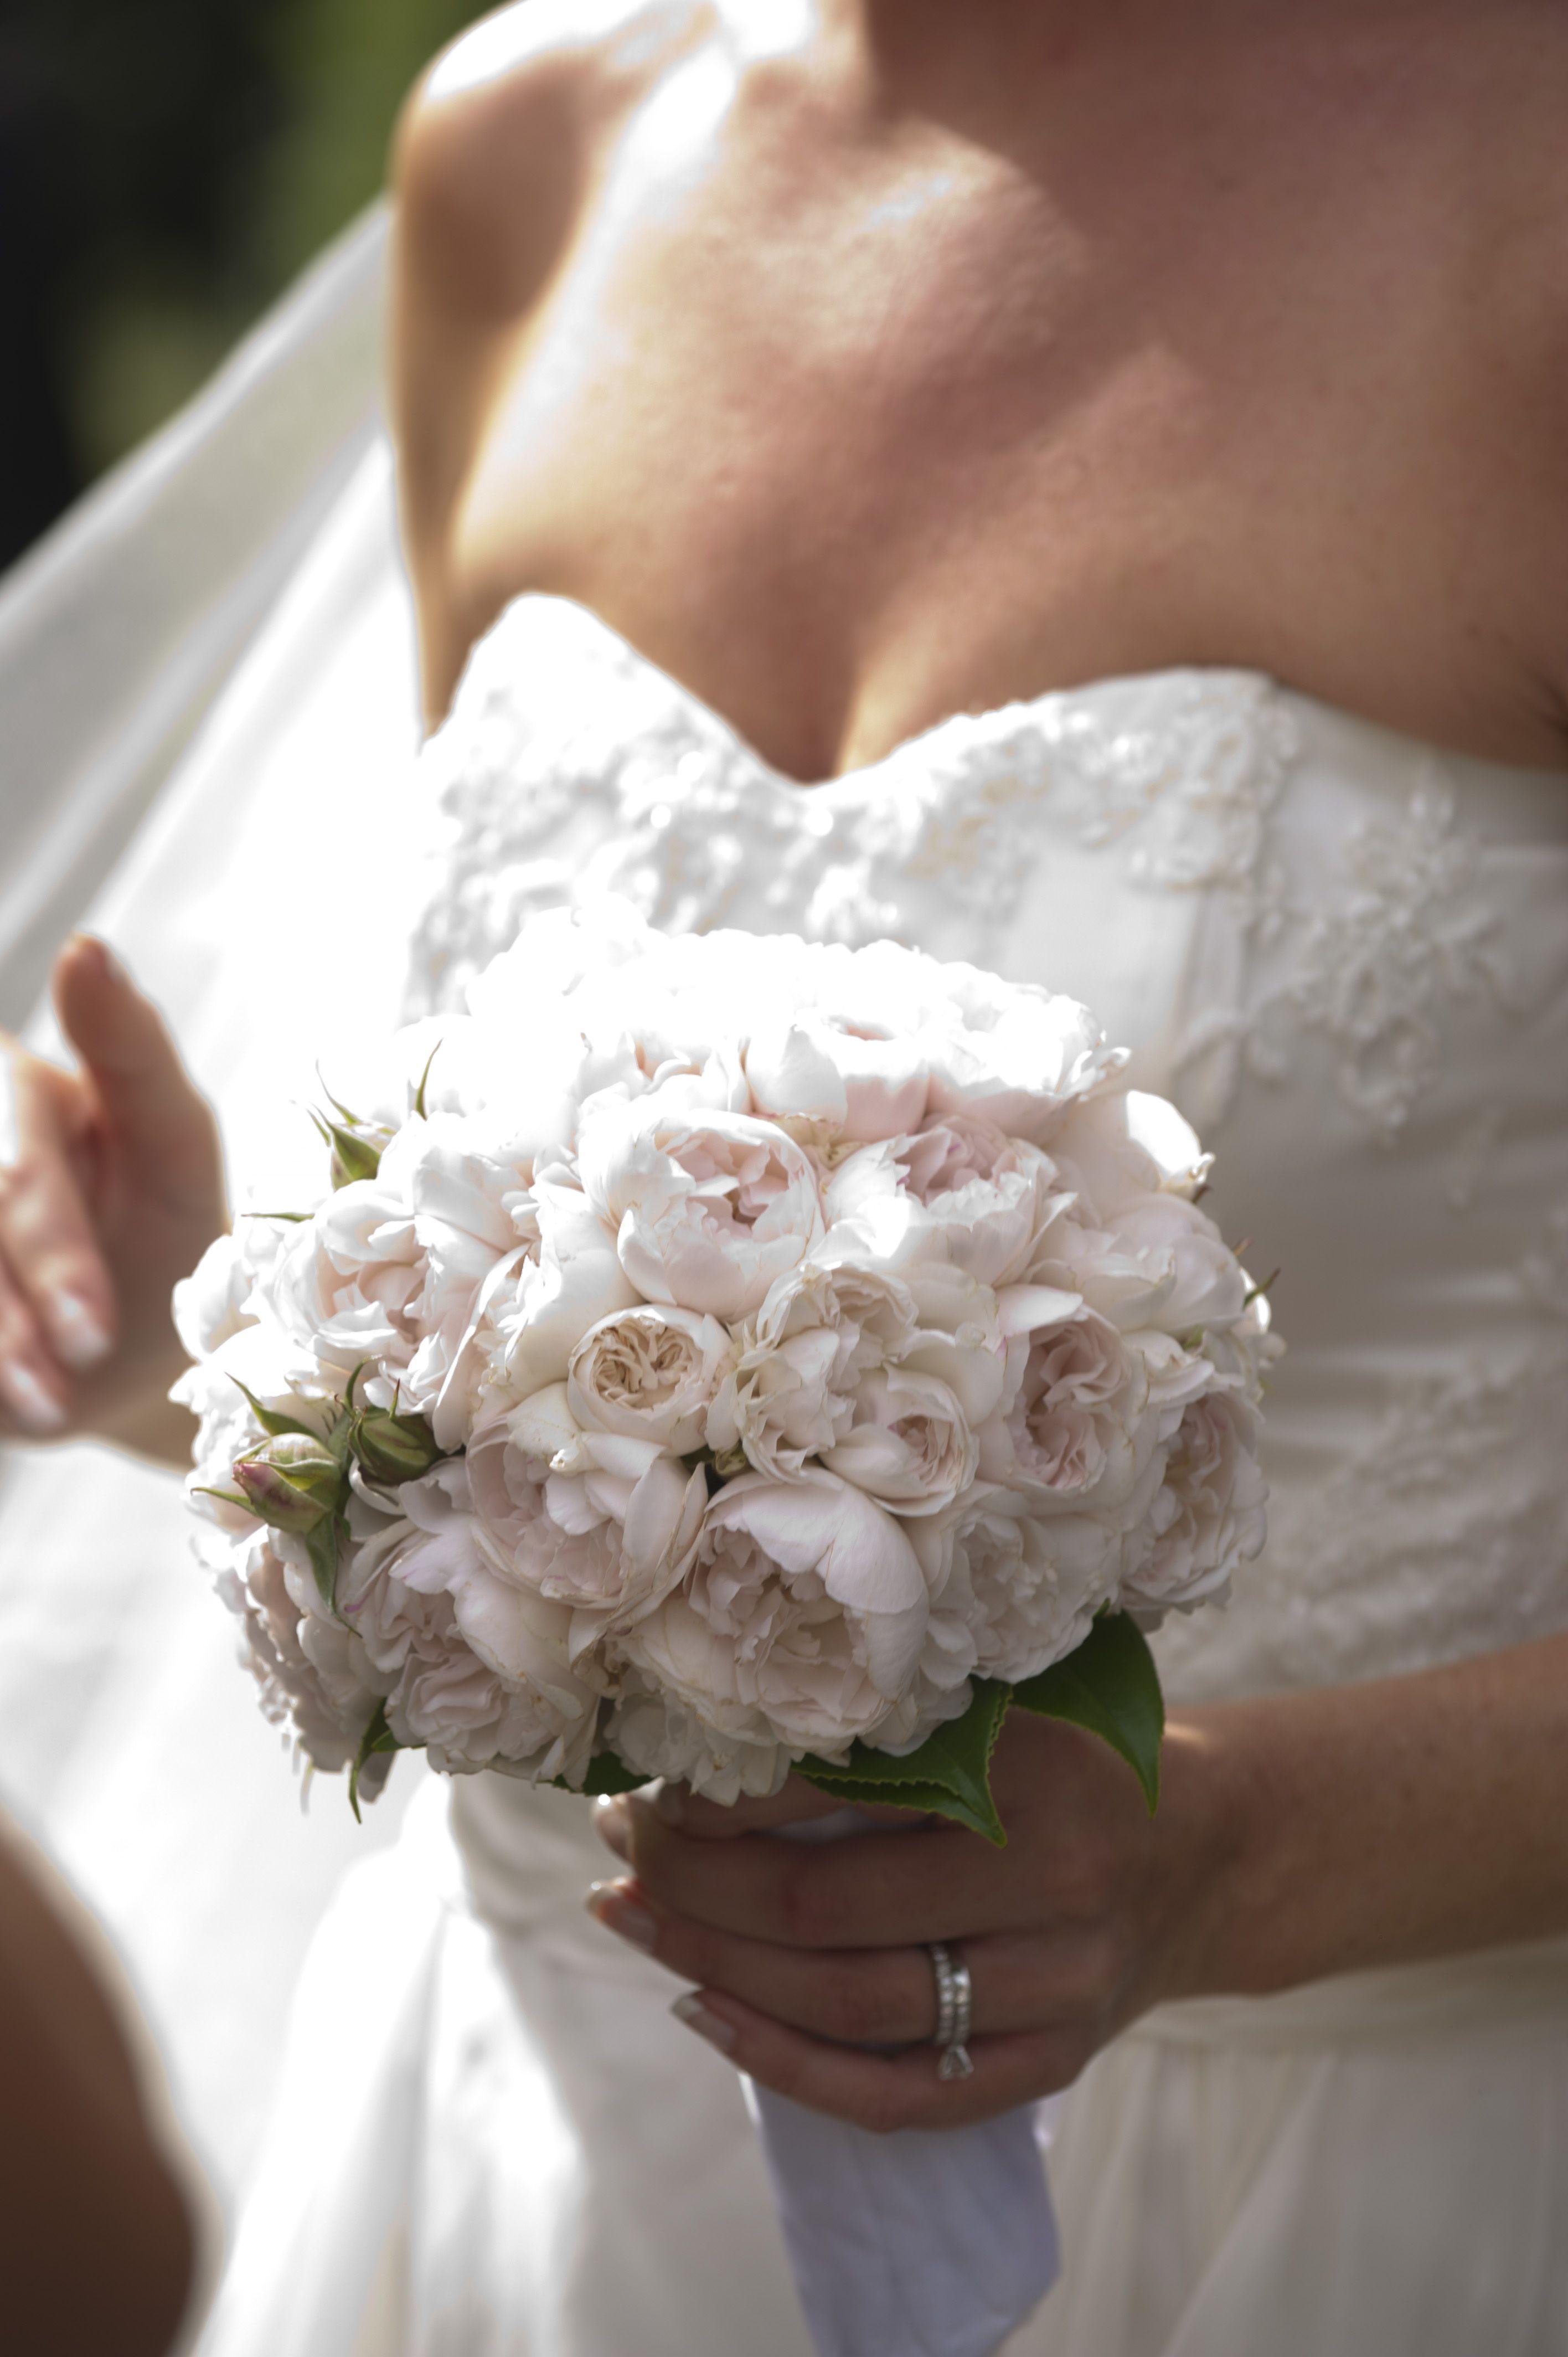 David Austin Rose Wedding Bouquet Matrimonio Sposa